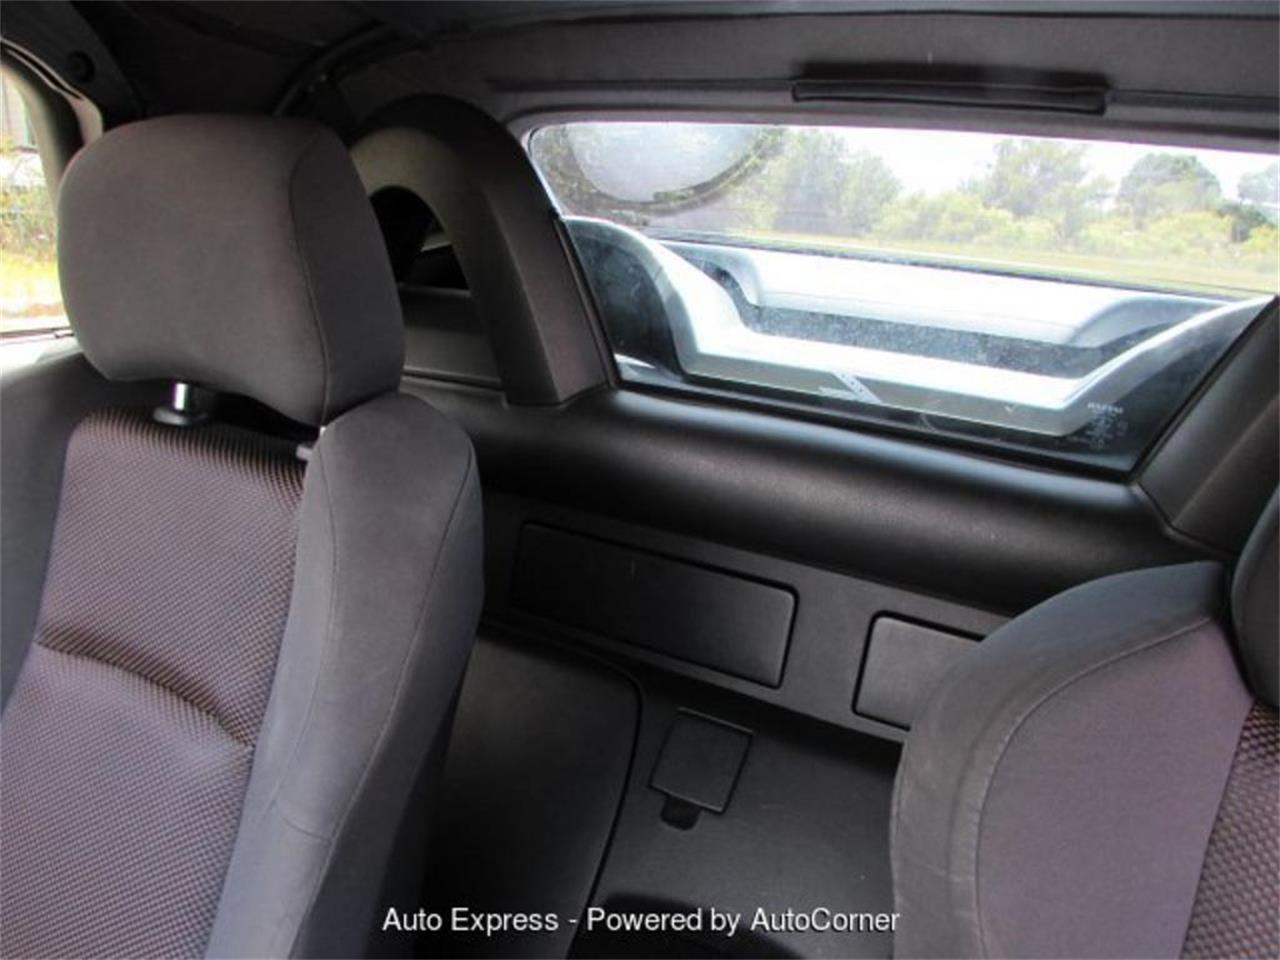 2005 Nissan 350Z (CC-1216041) for sale in Orlando, Florida